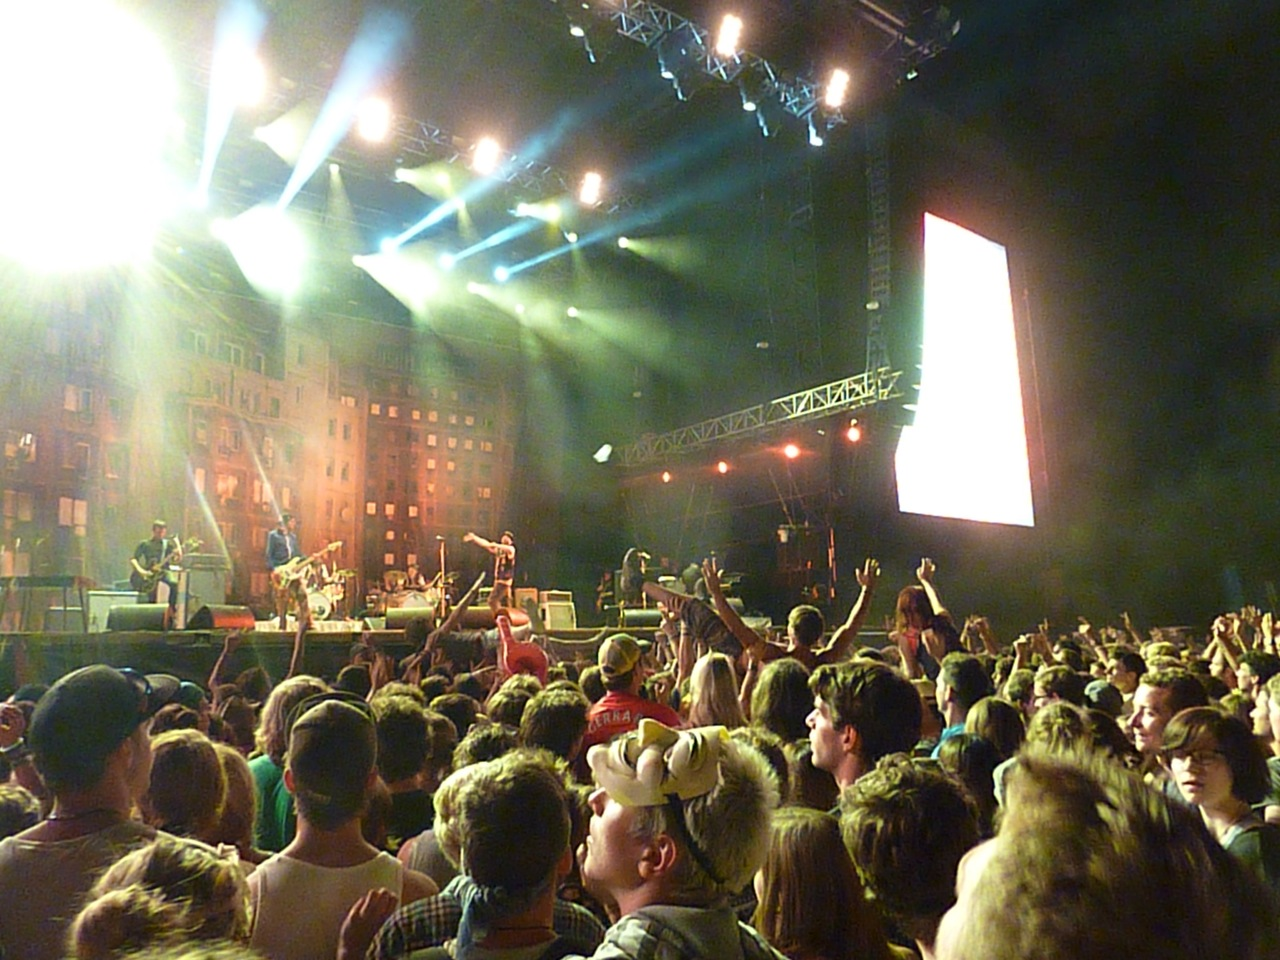 FM4 Frequency Festival St.Pölten/Österreich 15.-18.08.2012 mit The Killers, Placebo, The Cure, Korn, The Black Keys, Bloc Party, Beatsteaks, Sportfreunde Stiller u.v.a